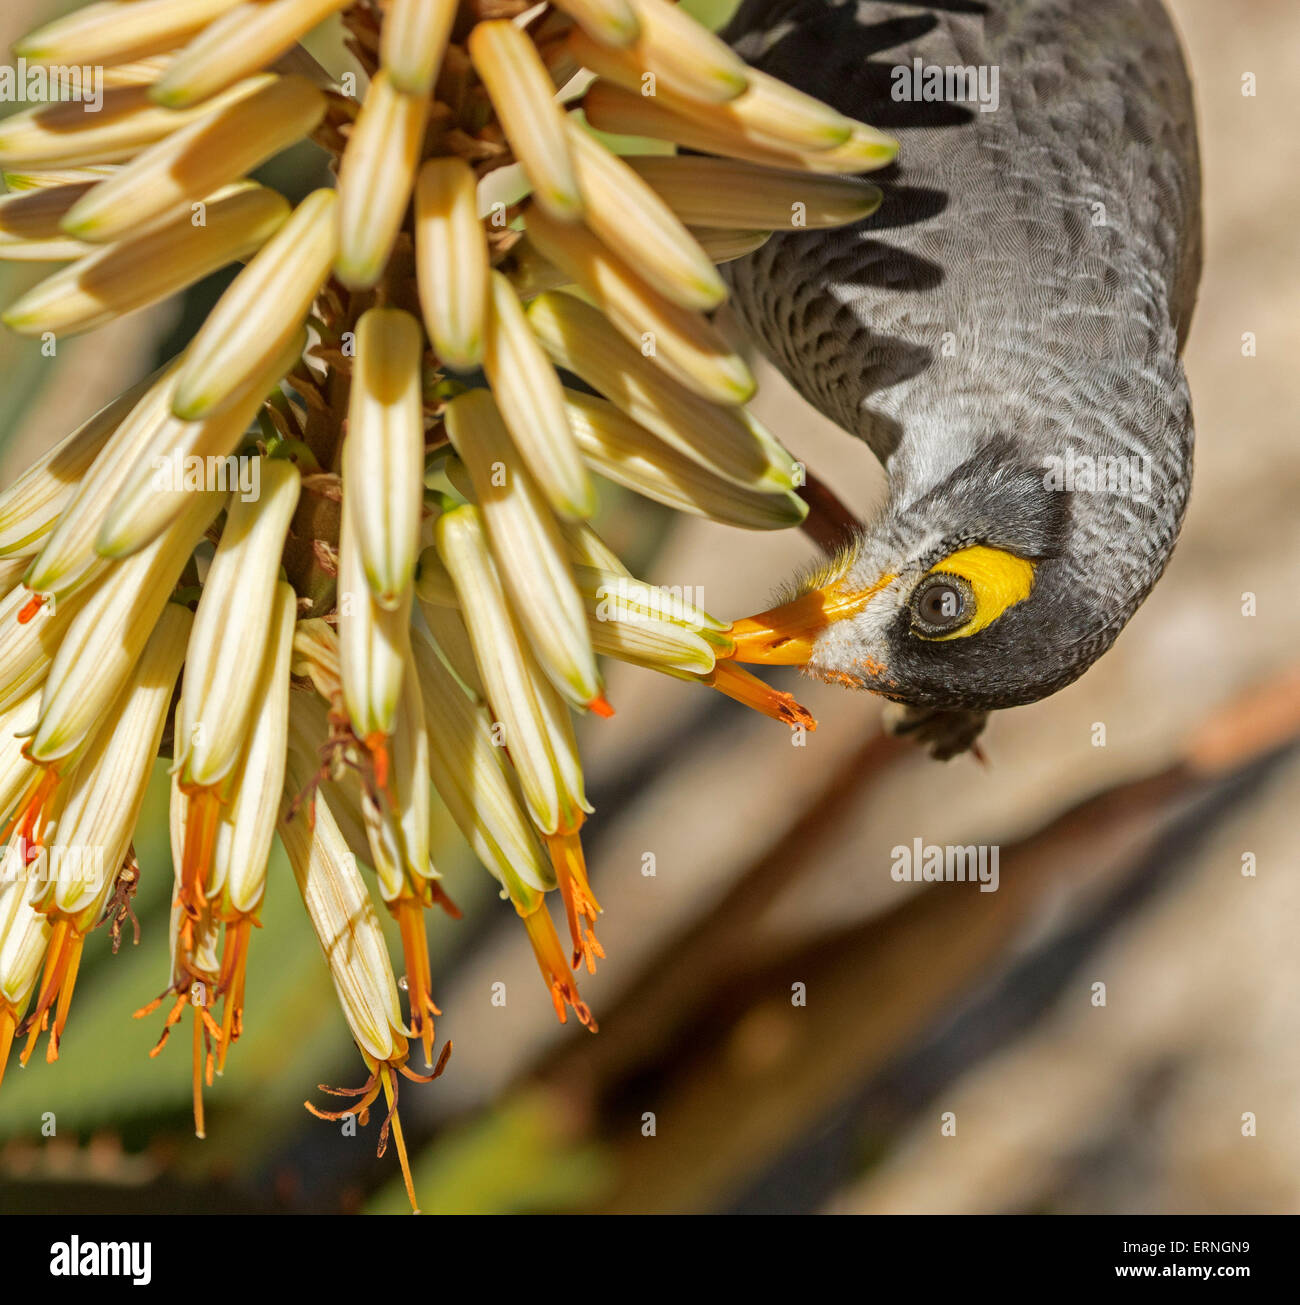 Laut Bergmann Vogel, Manorina Melanocephala auf den Kopf hängend Fütterung auf Creme röhrenförmigen Stockbild